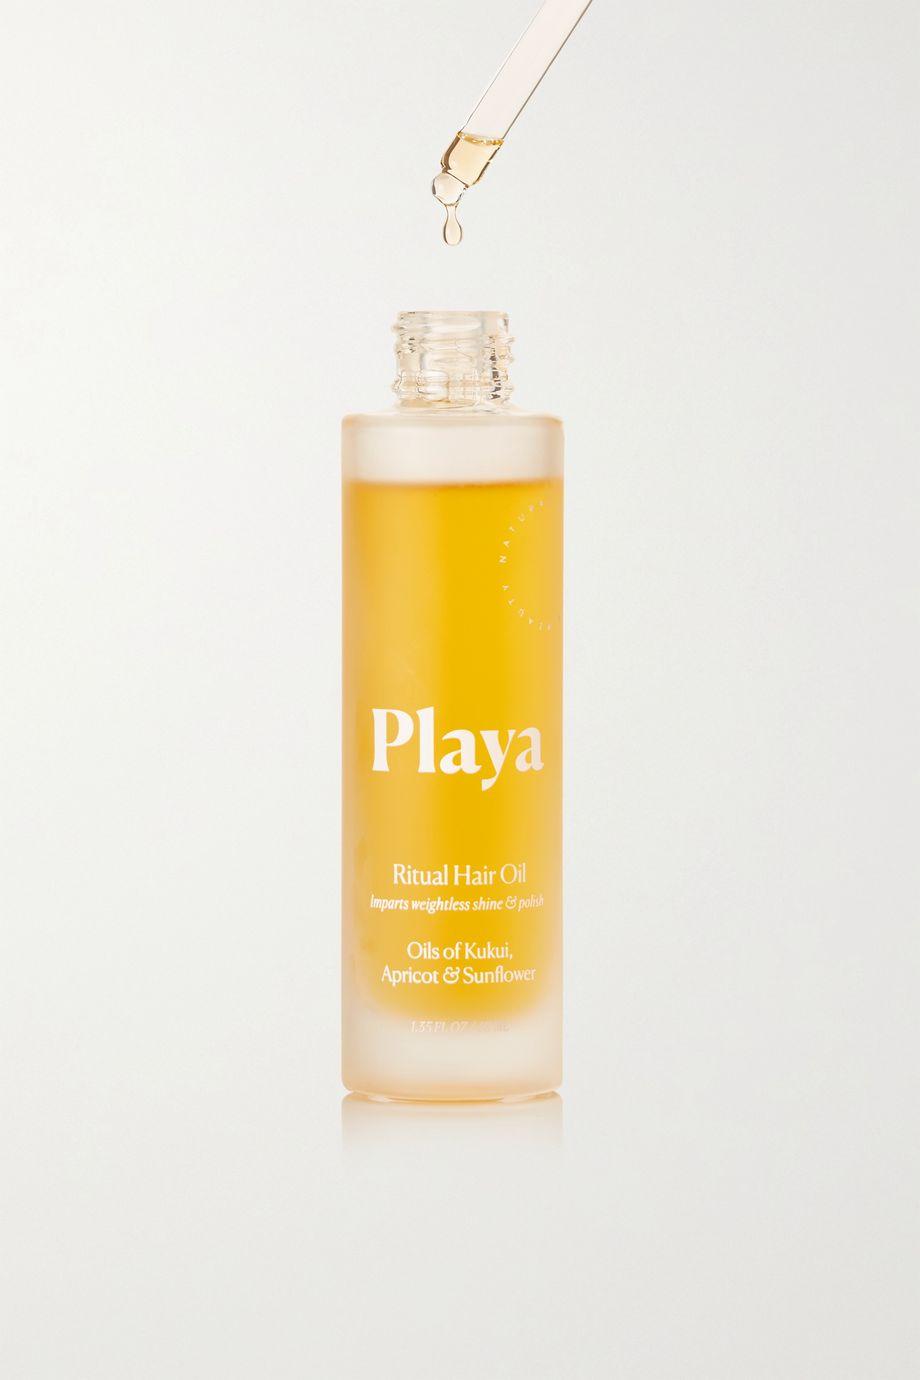 Playa Beauty Ritual Hair Oil, 45ml